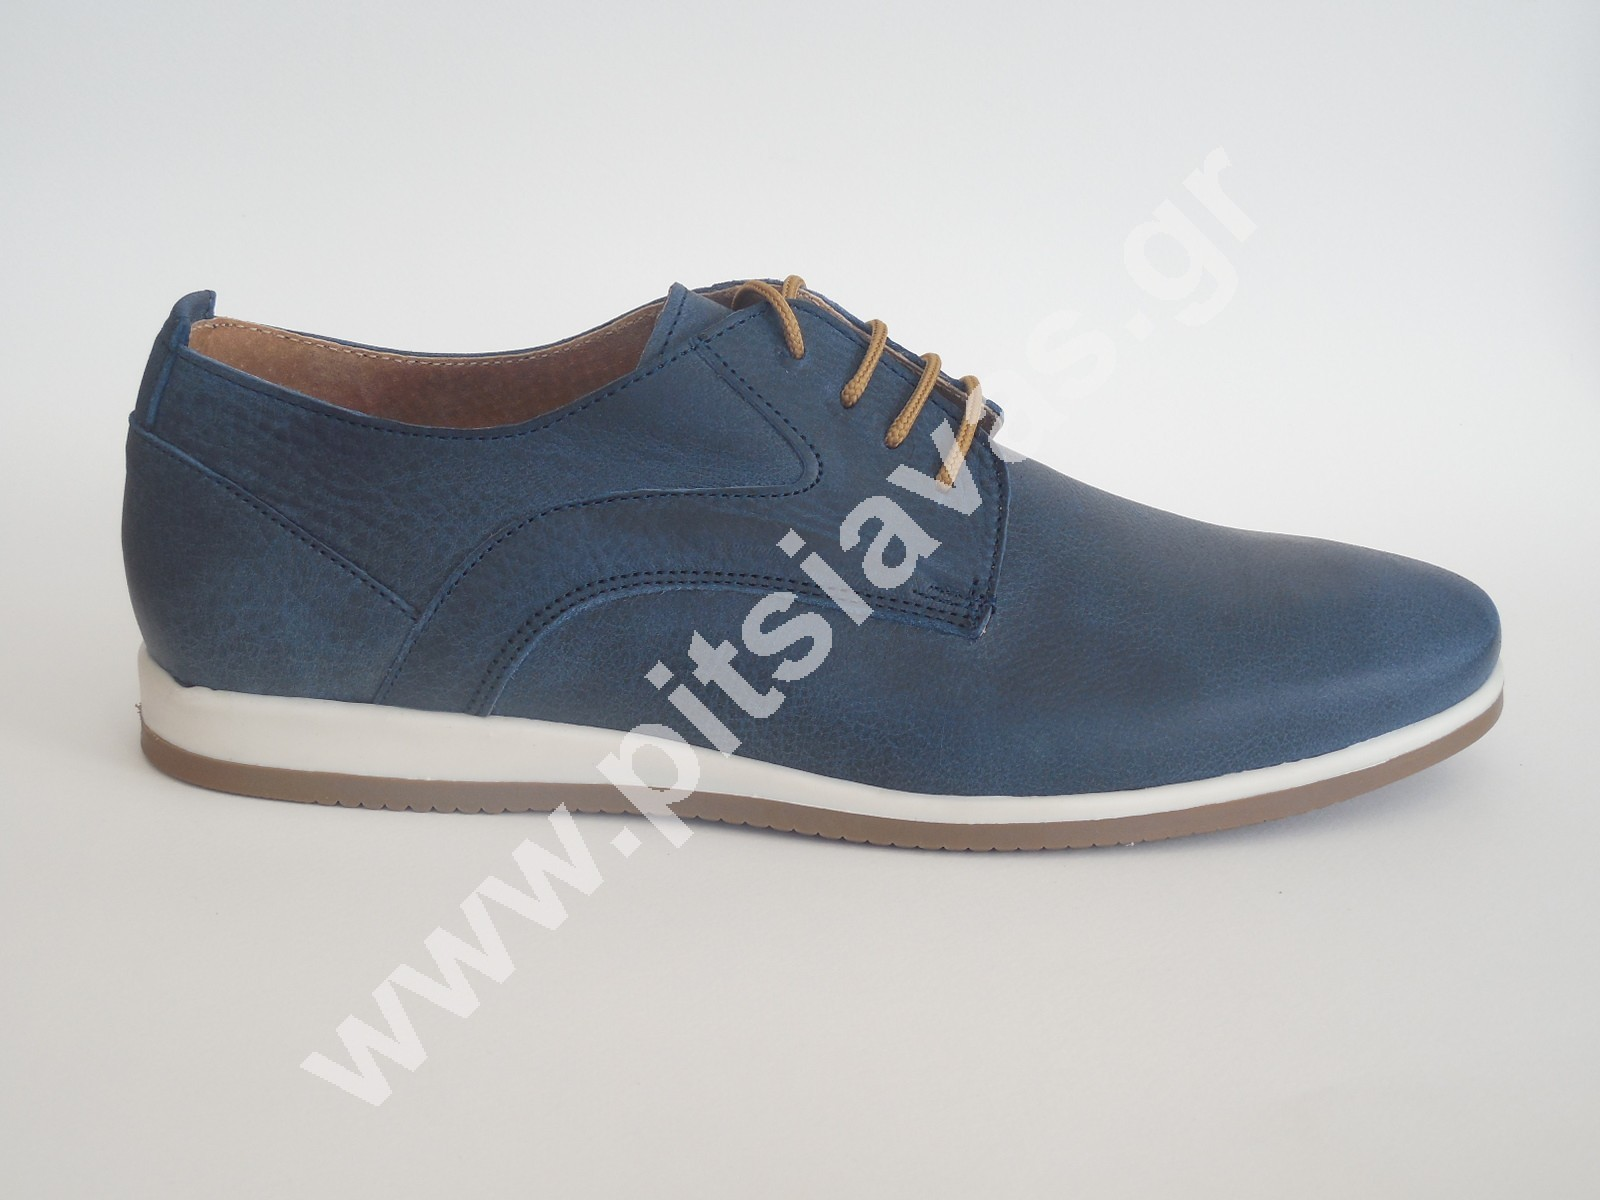 fbeb9d52159 Παπούτσια Ανδρικα NiceStep 700 ΜΠΛΕ καστόρι - pitsiavas